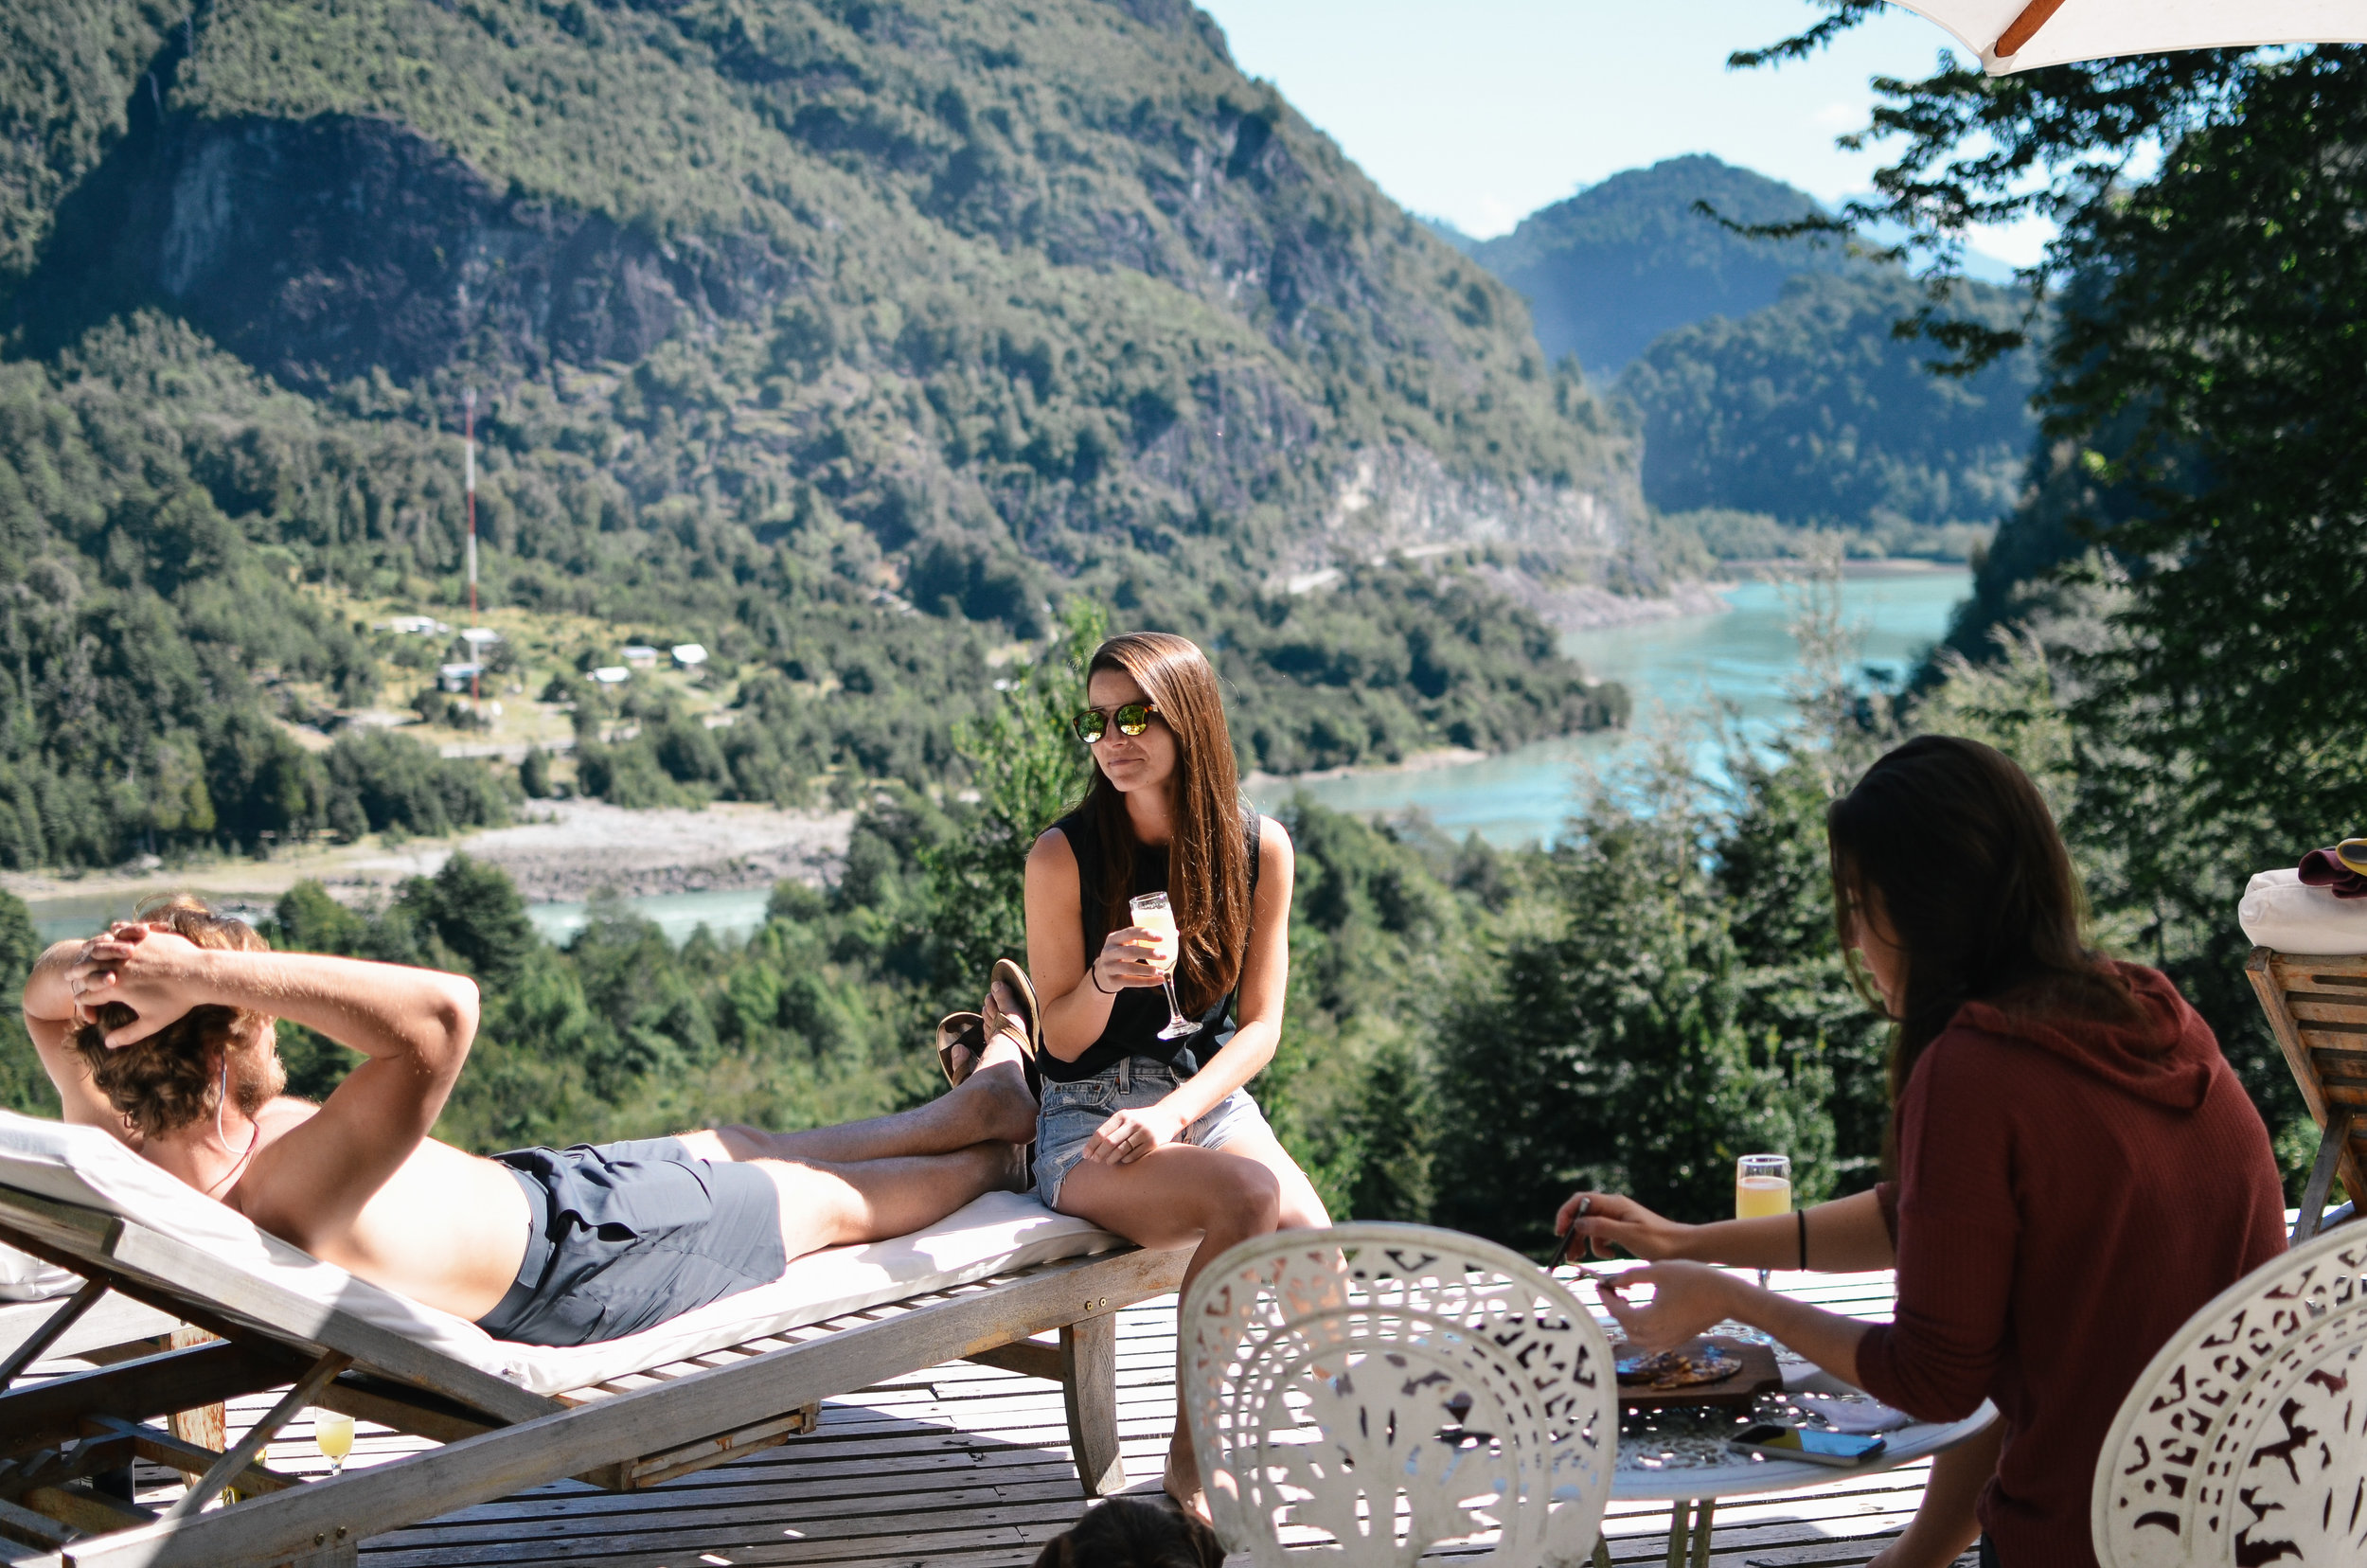 barraco+lodge+chile+life+on+pine+travel+blog+life+on+pine_DSC_1298.jpg